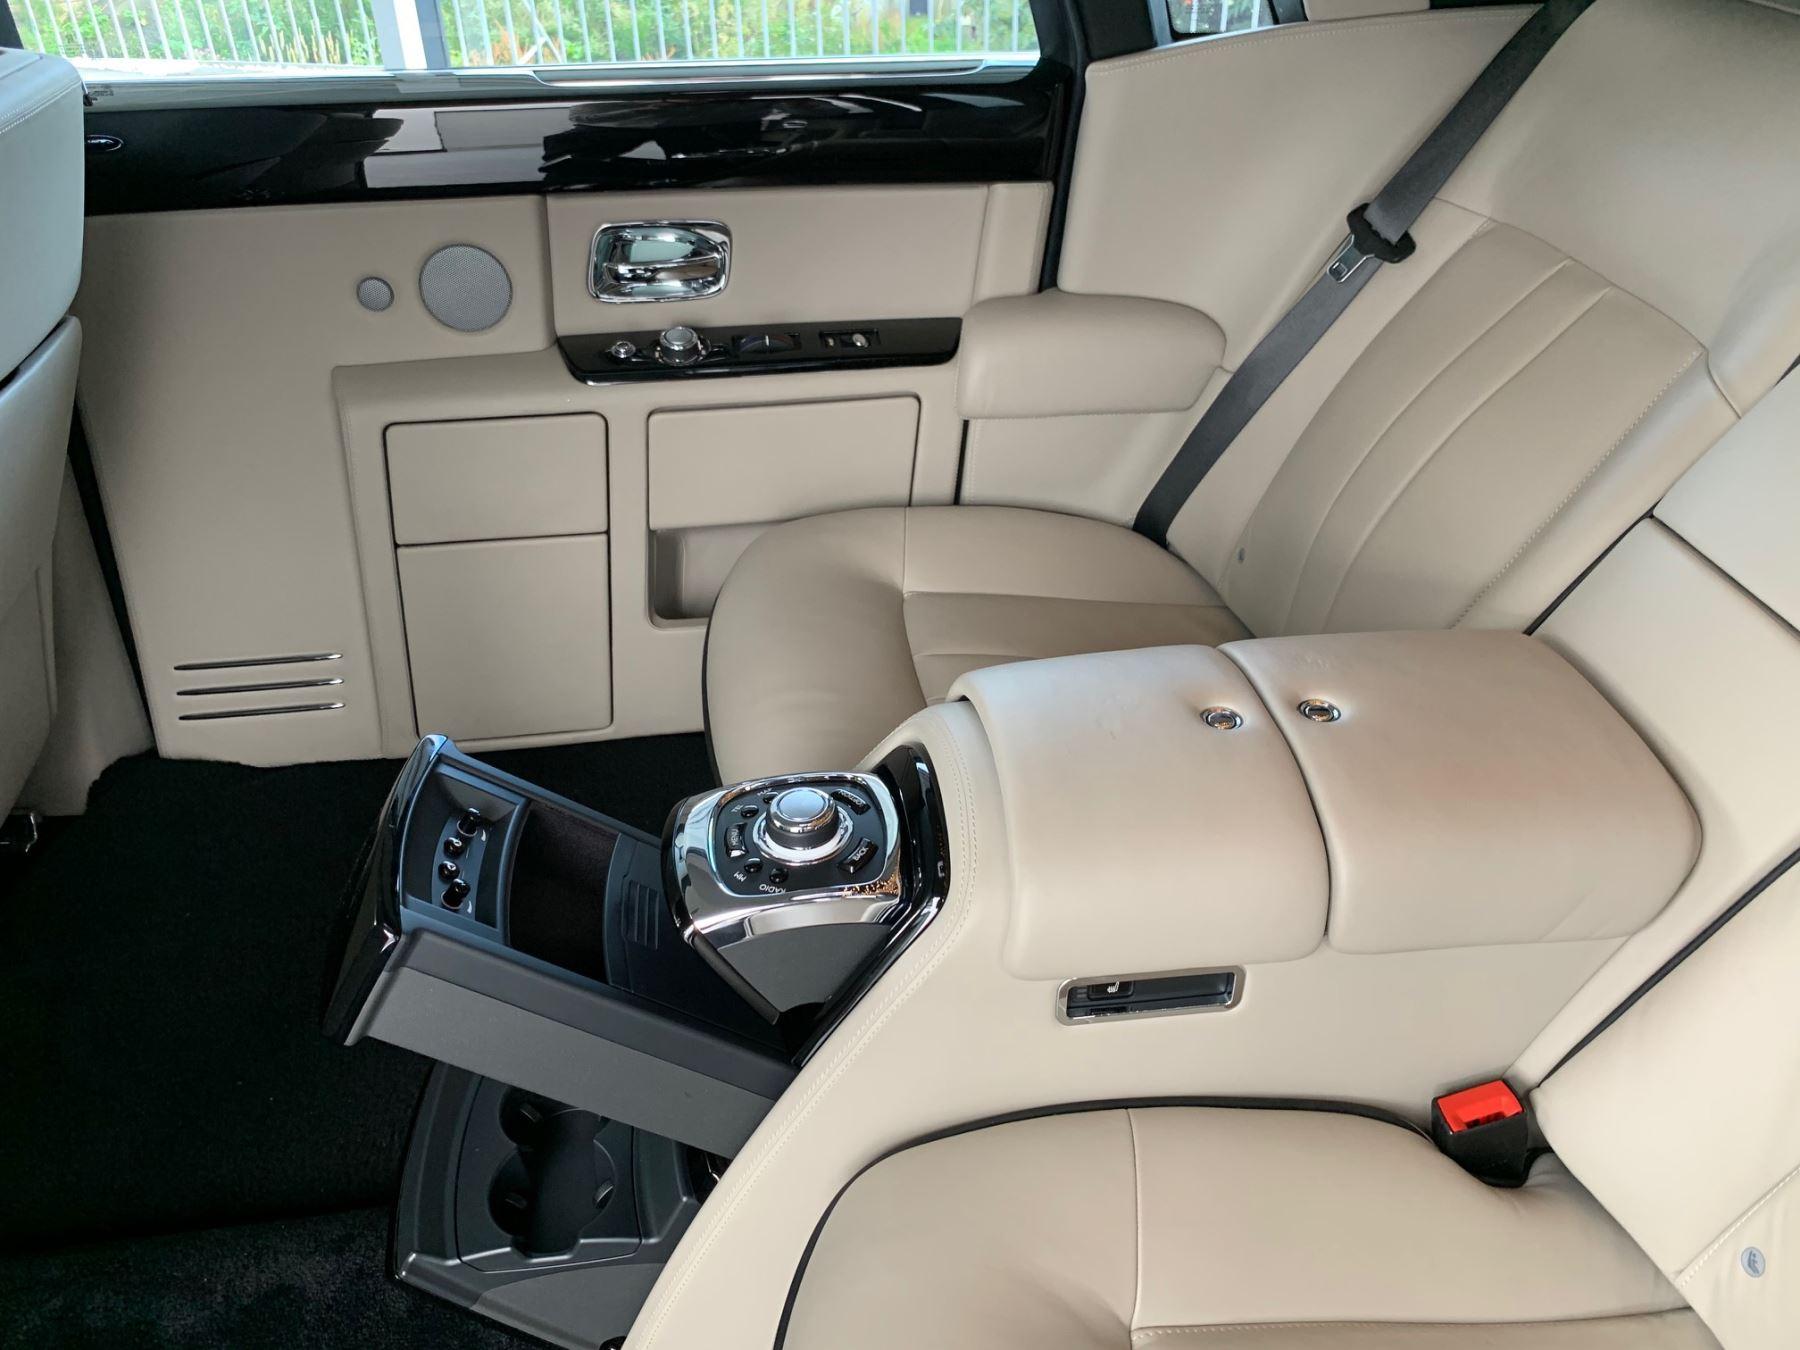 Rolls-Royce Phantom Extended Wheelbase II 4dr Auto Extended Wheel Base image 13